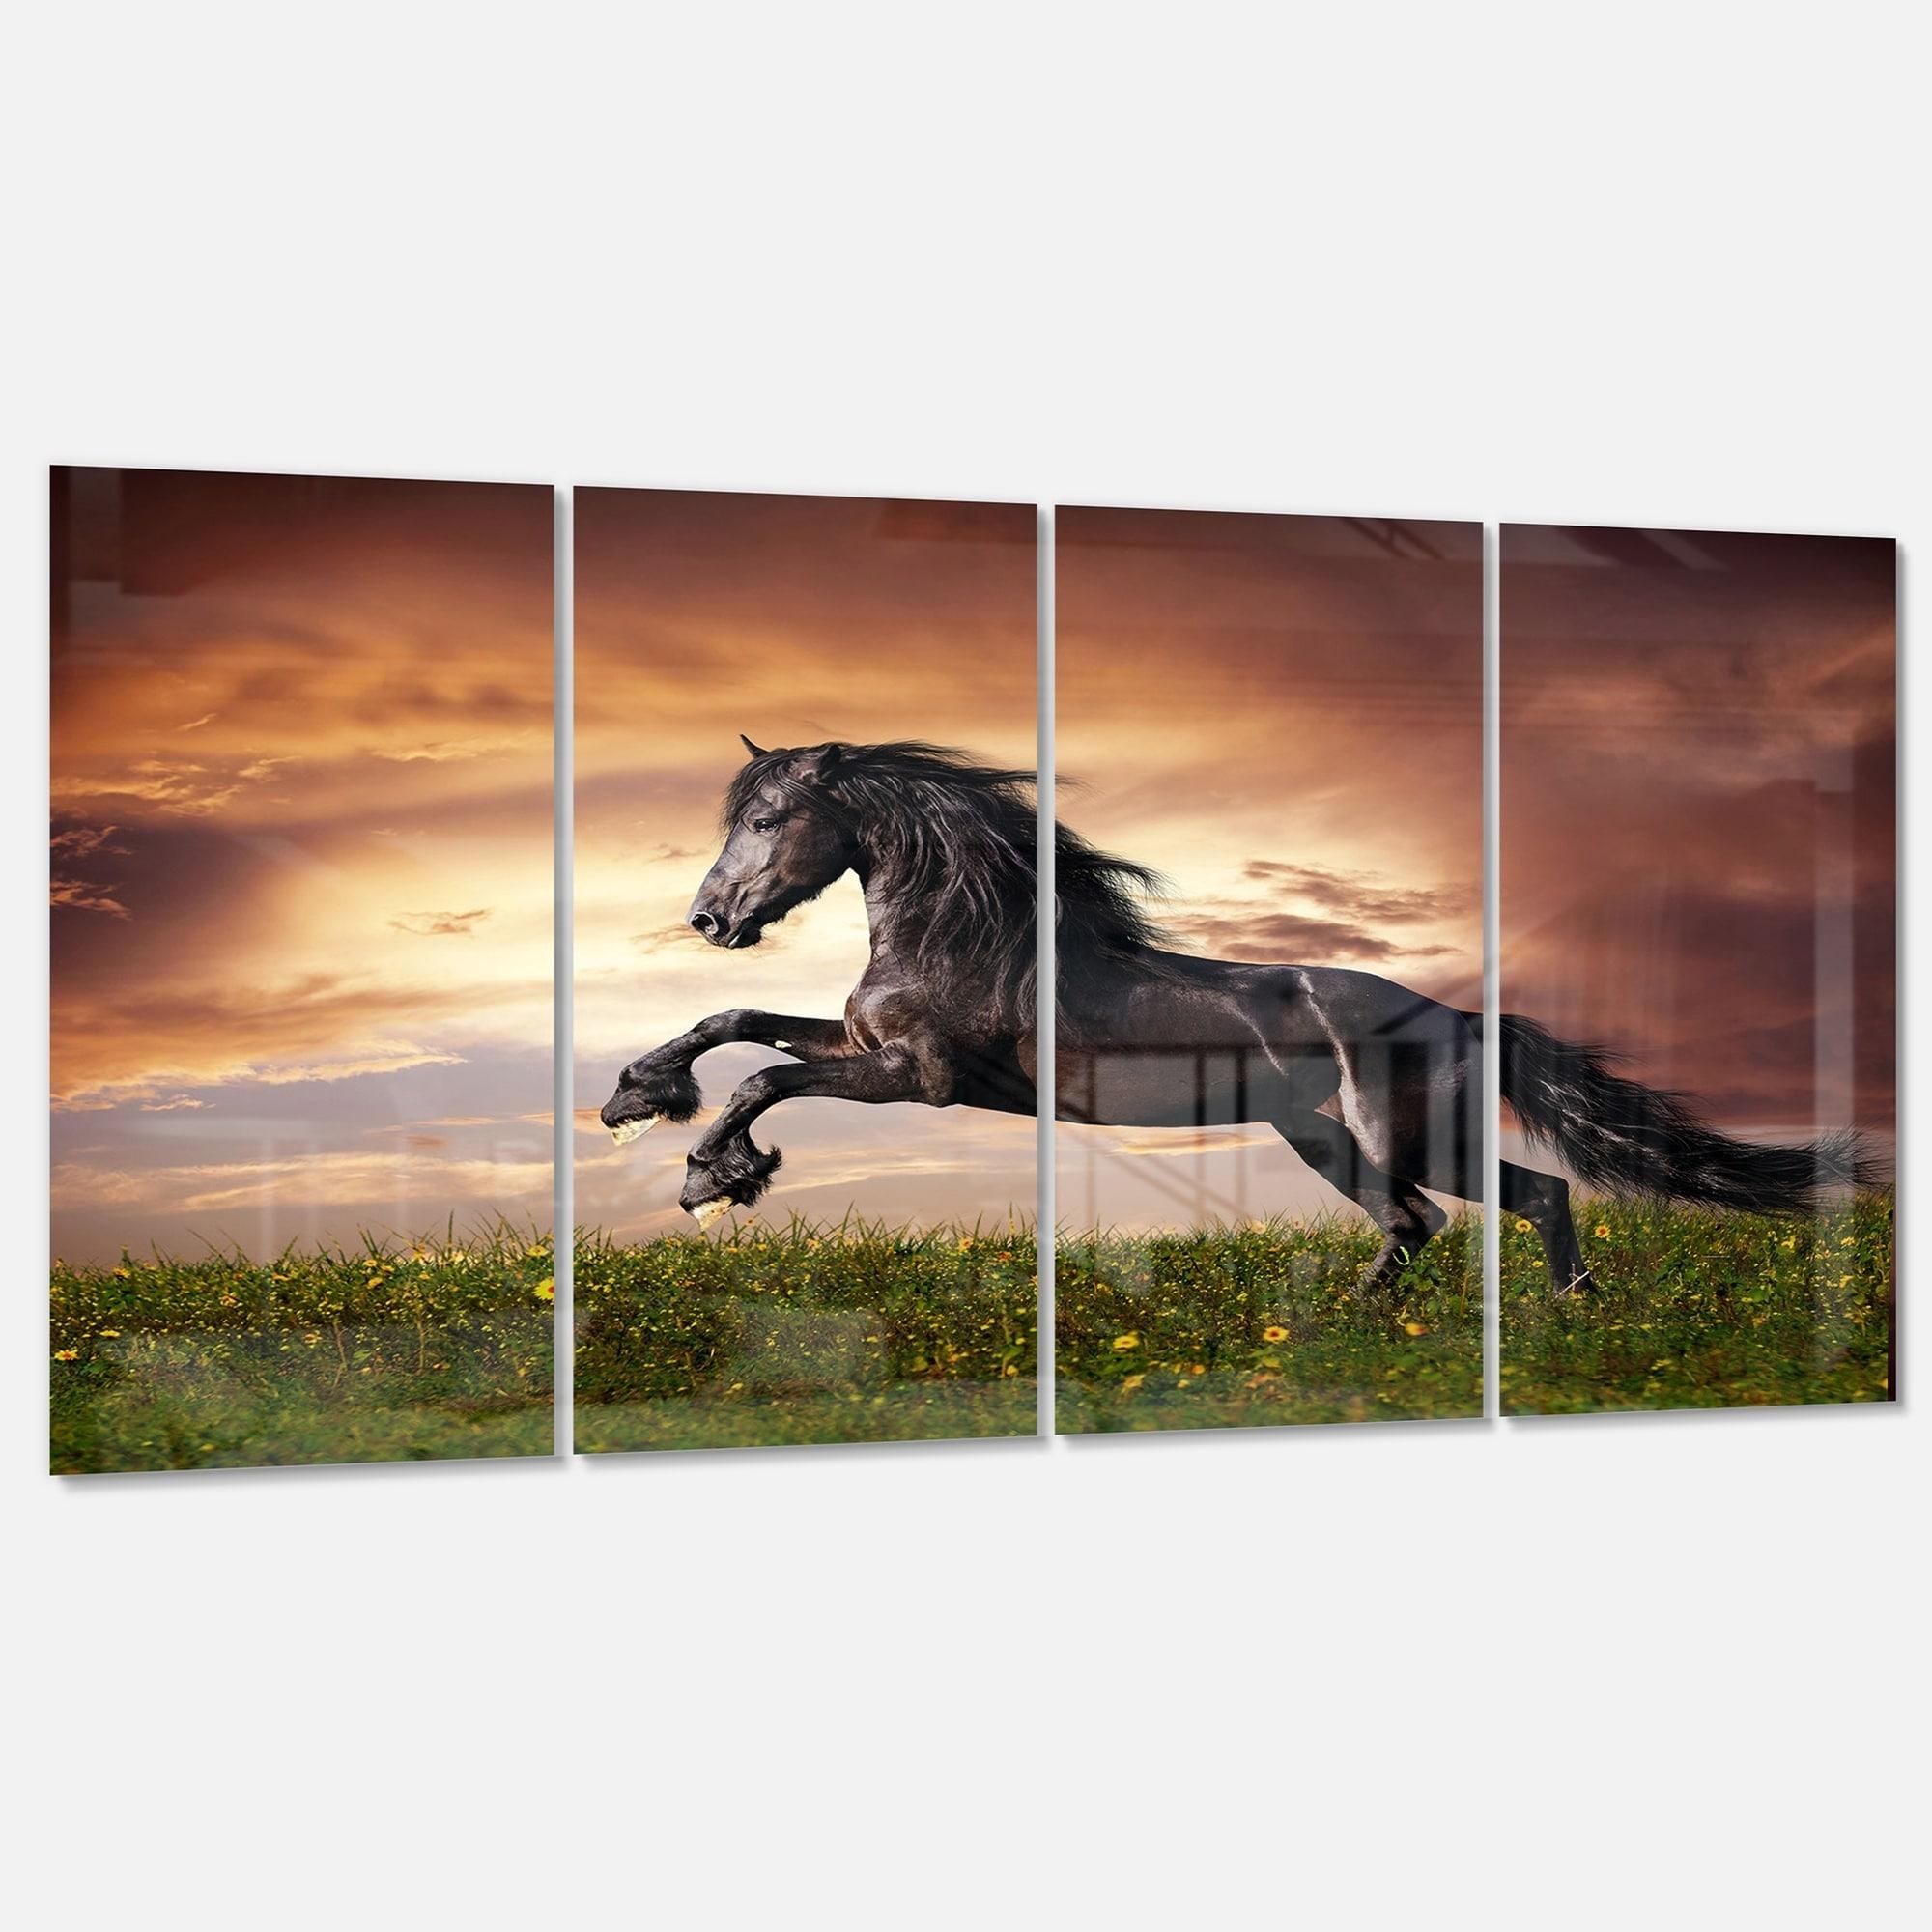 Designart Black Friesian Horse Gallop Animal Photography Metal Wall Art Overstock 13622393 23 X 23 Disc Of 23 Inch